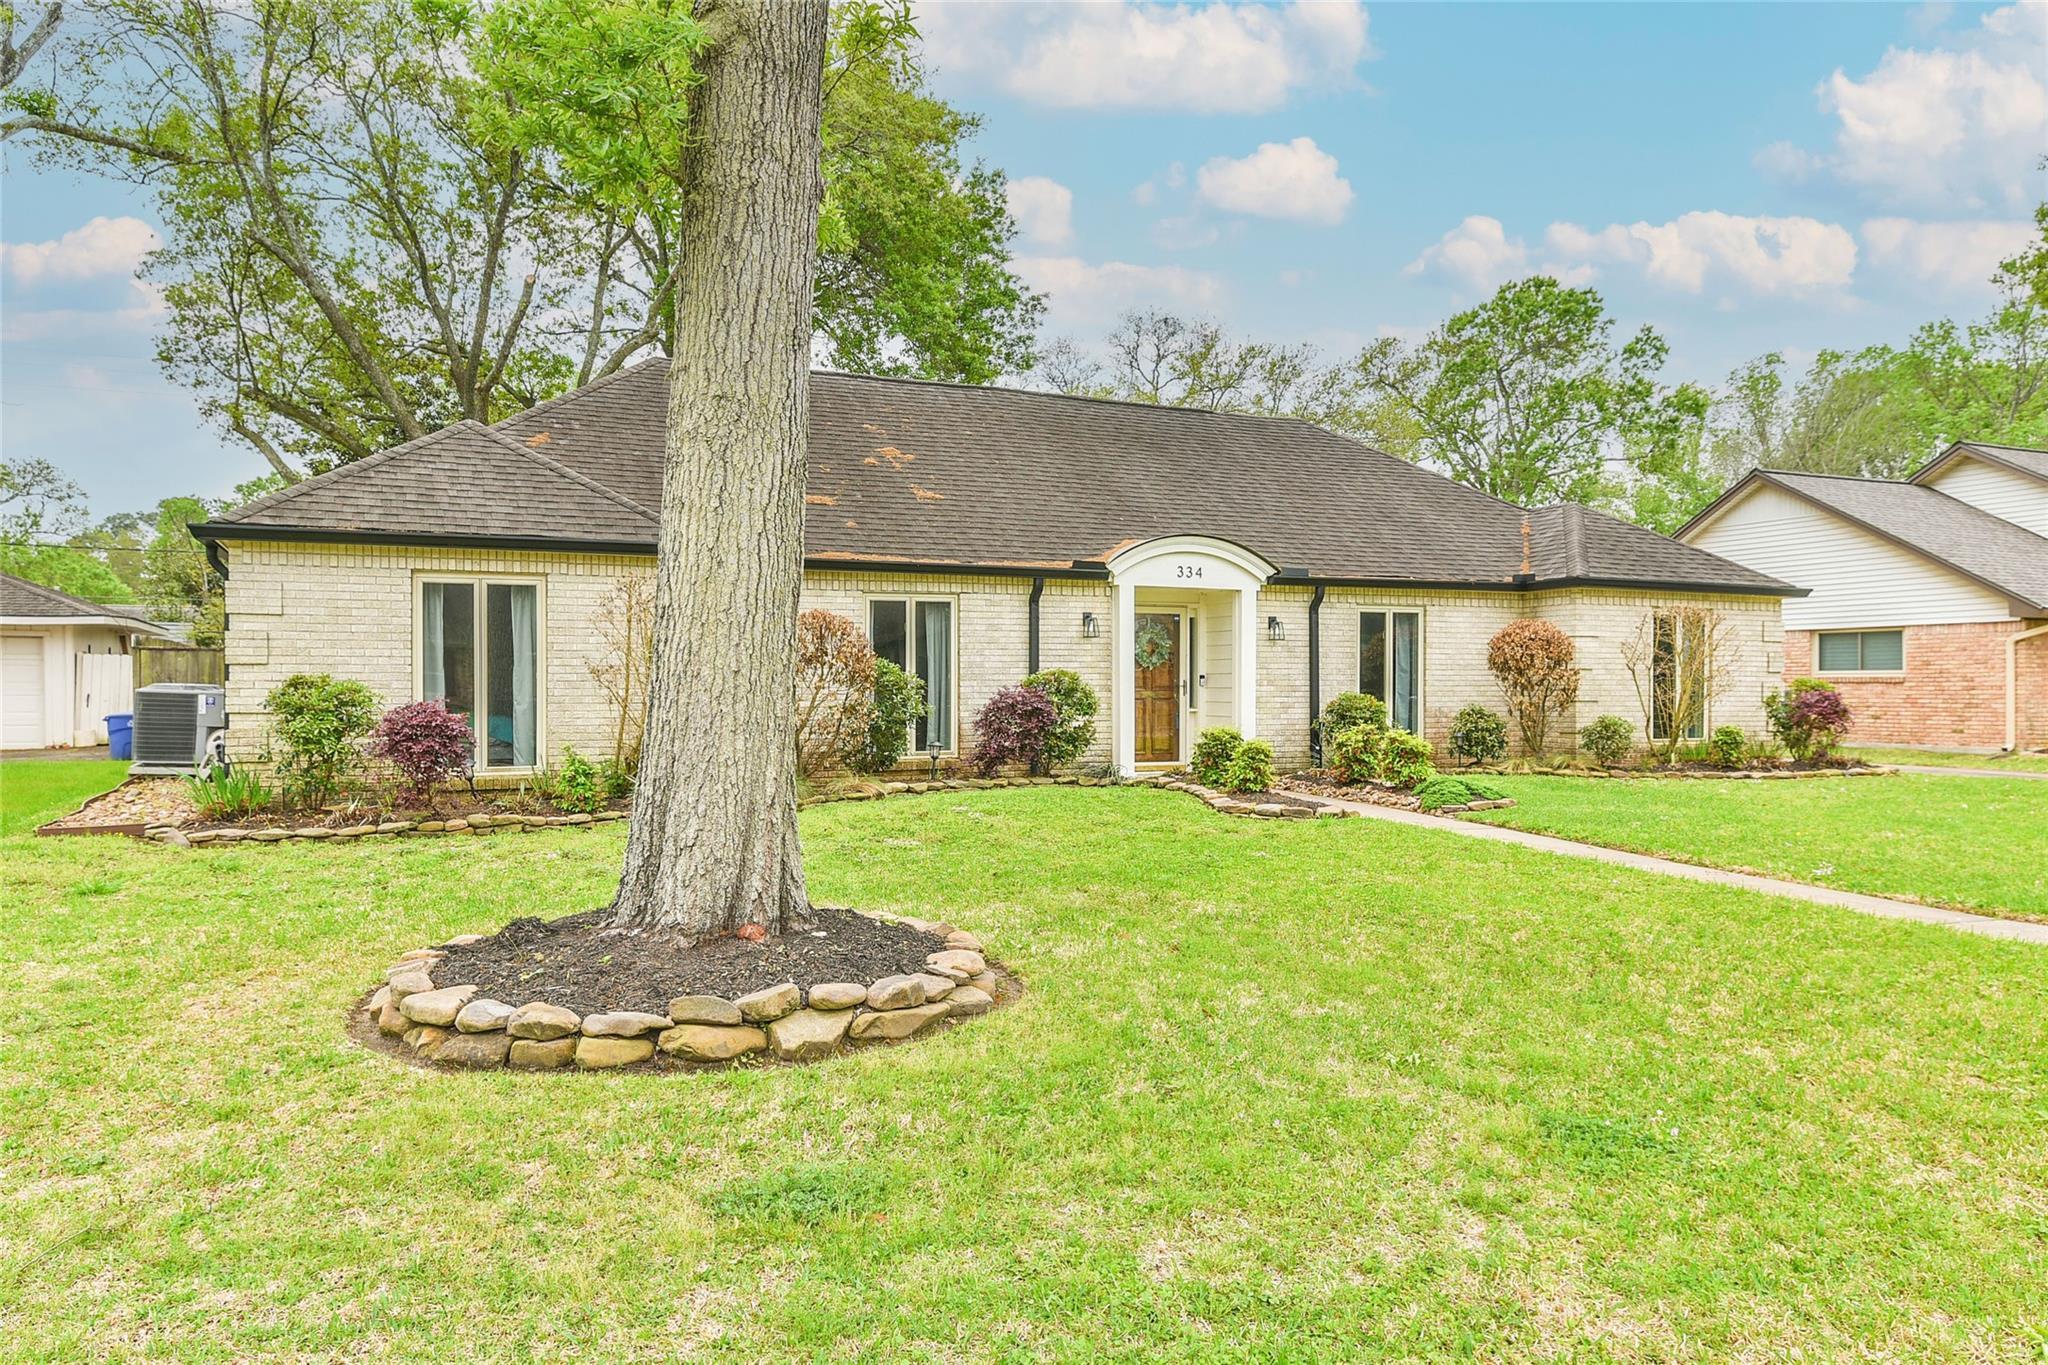 334 Bayou View Drive Property Photo - El Lago, TX real estate listing